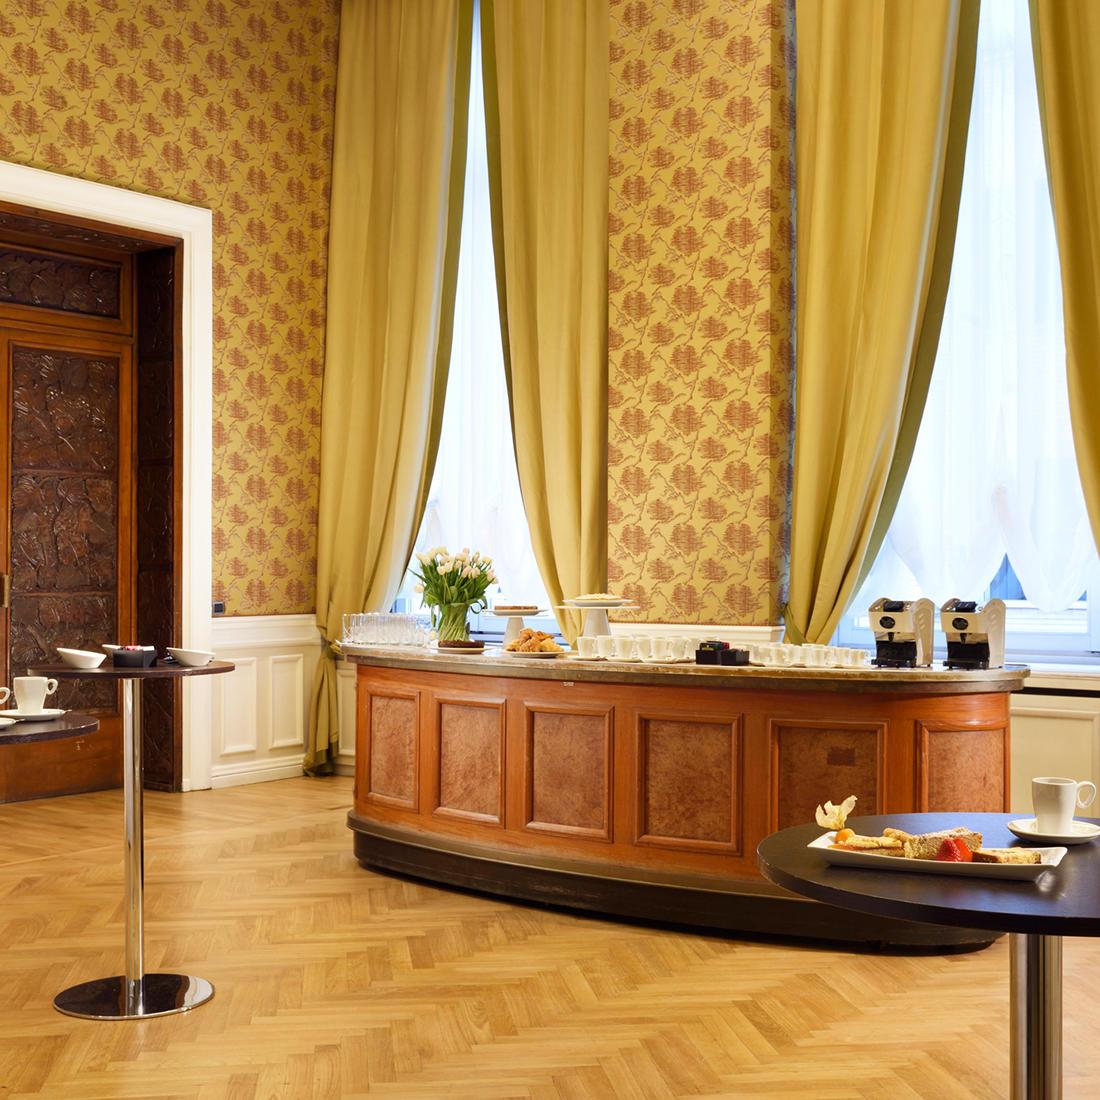 Sala Venaria Reale   Principi di Piemonte